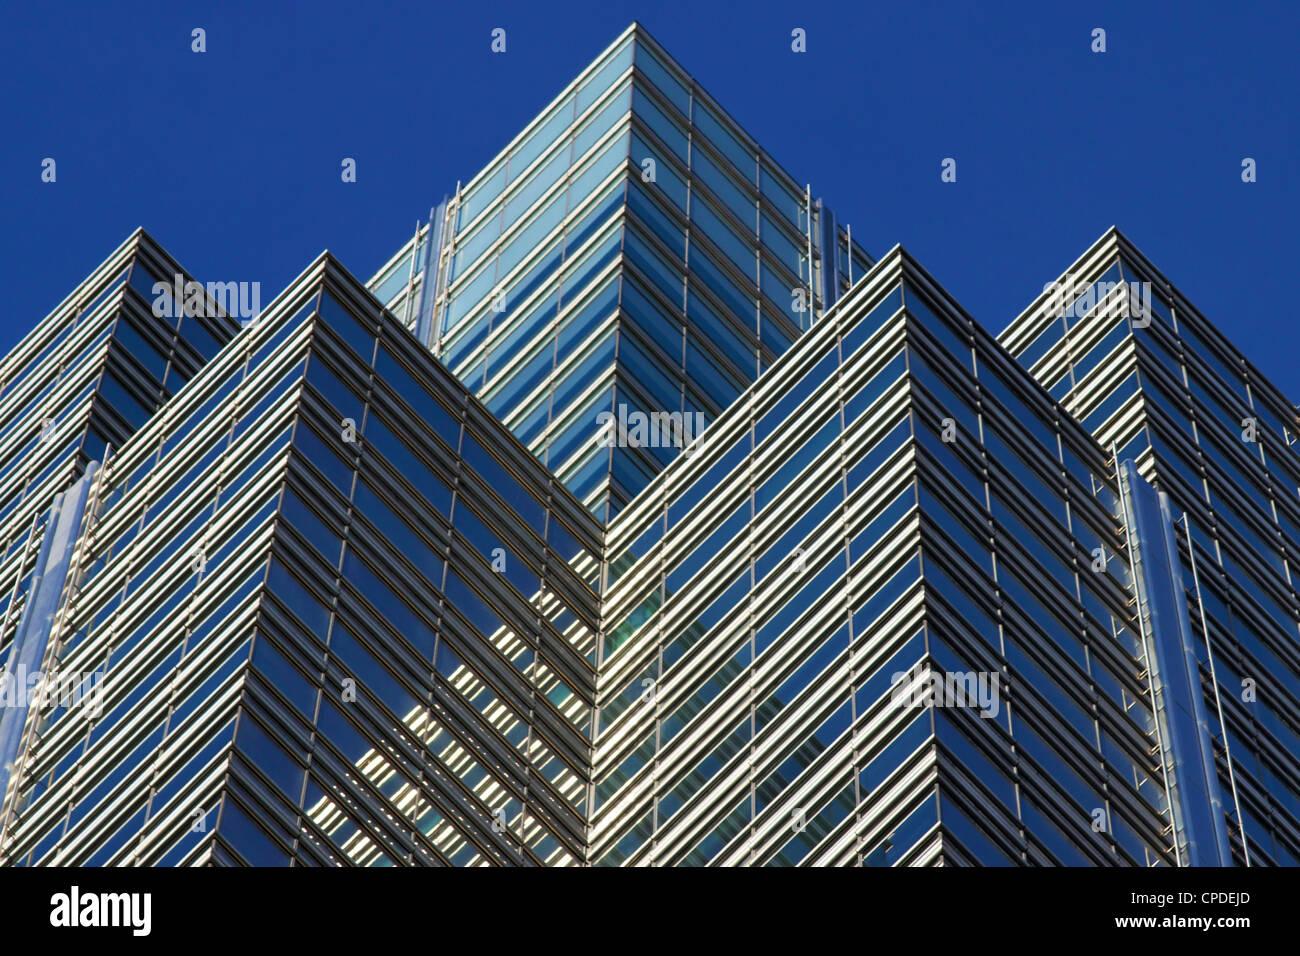 Canary Wharf, Docklands, London, England, United KIngdom, Europe - Stock Image